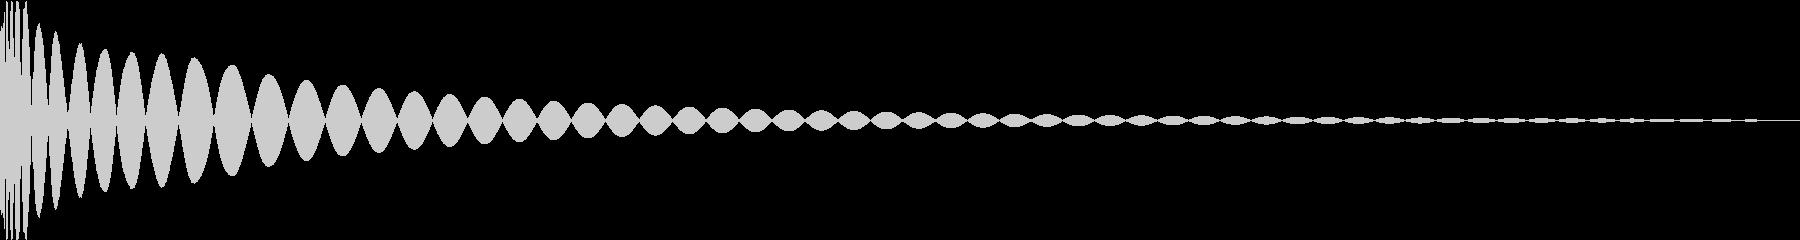 DTM Kick 74 オリジナル音源の未再生の波形